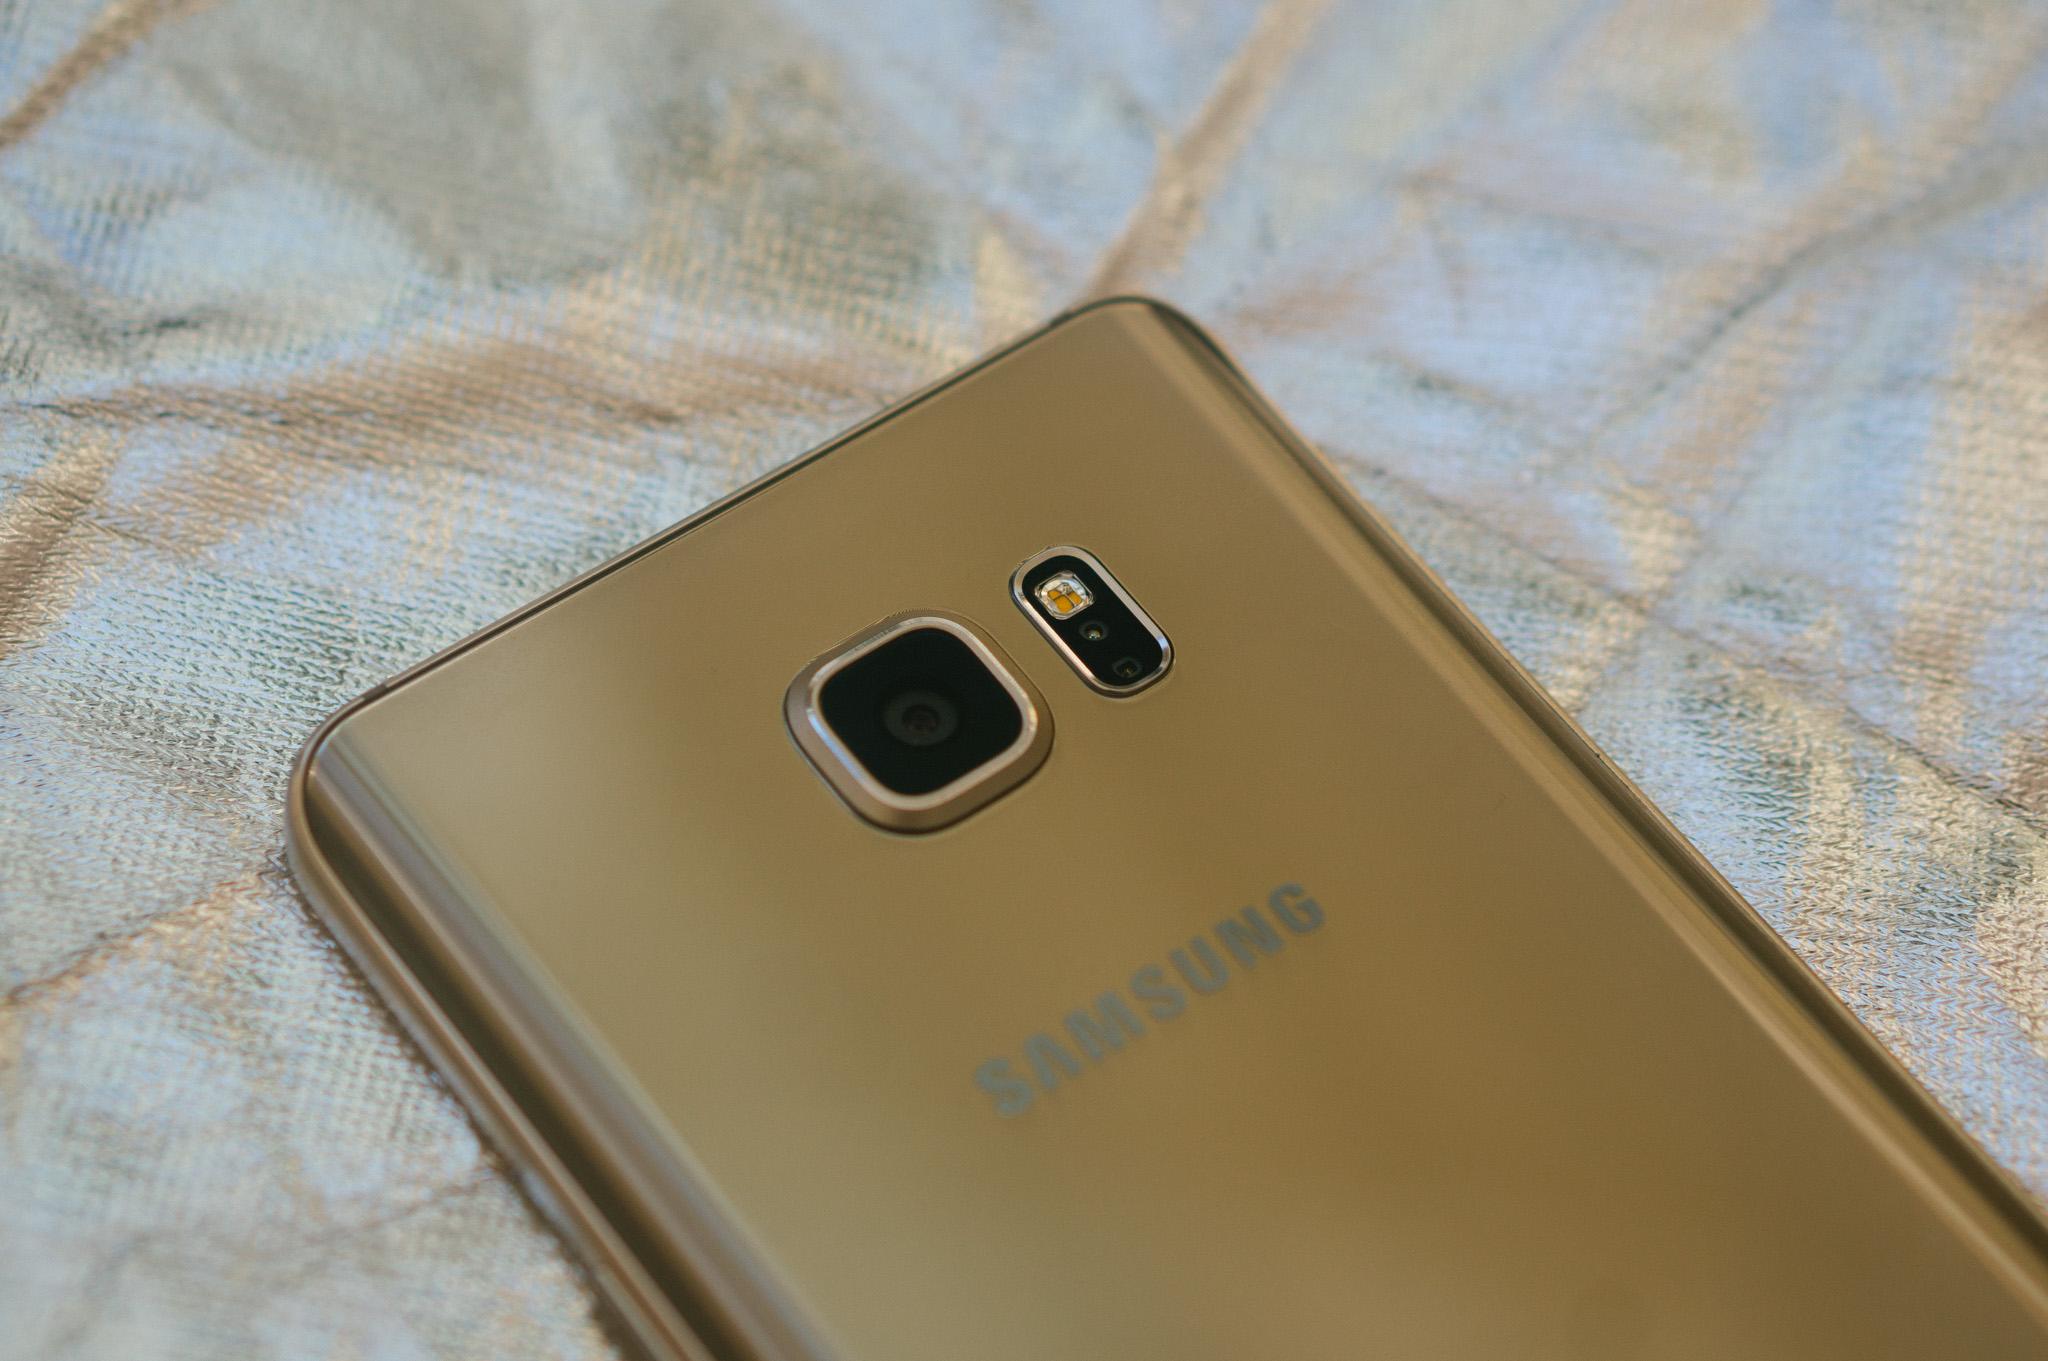 Samsung Galaxy Note 5 camera mới lạ